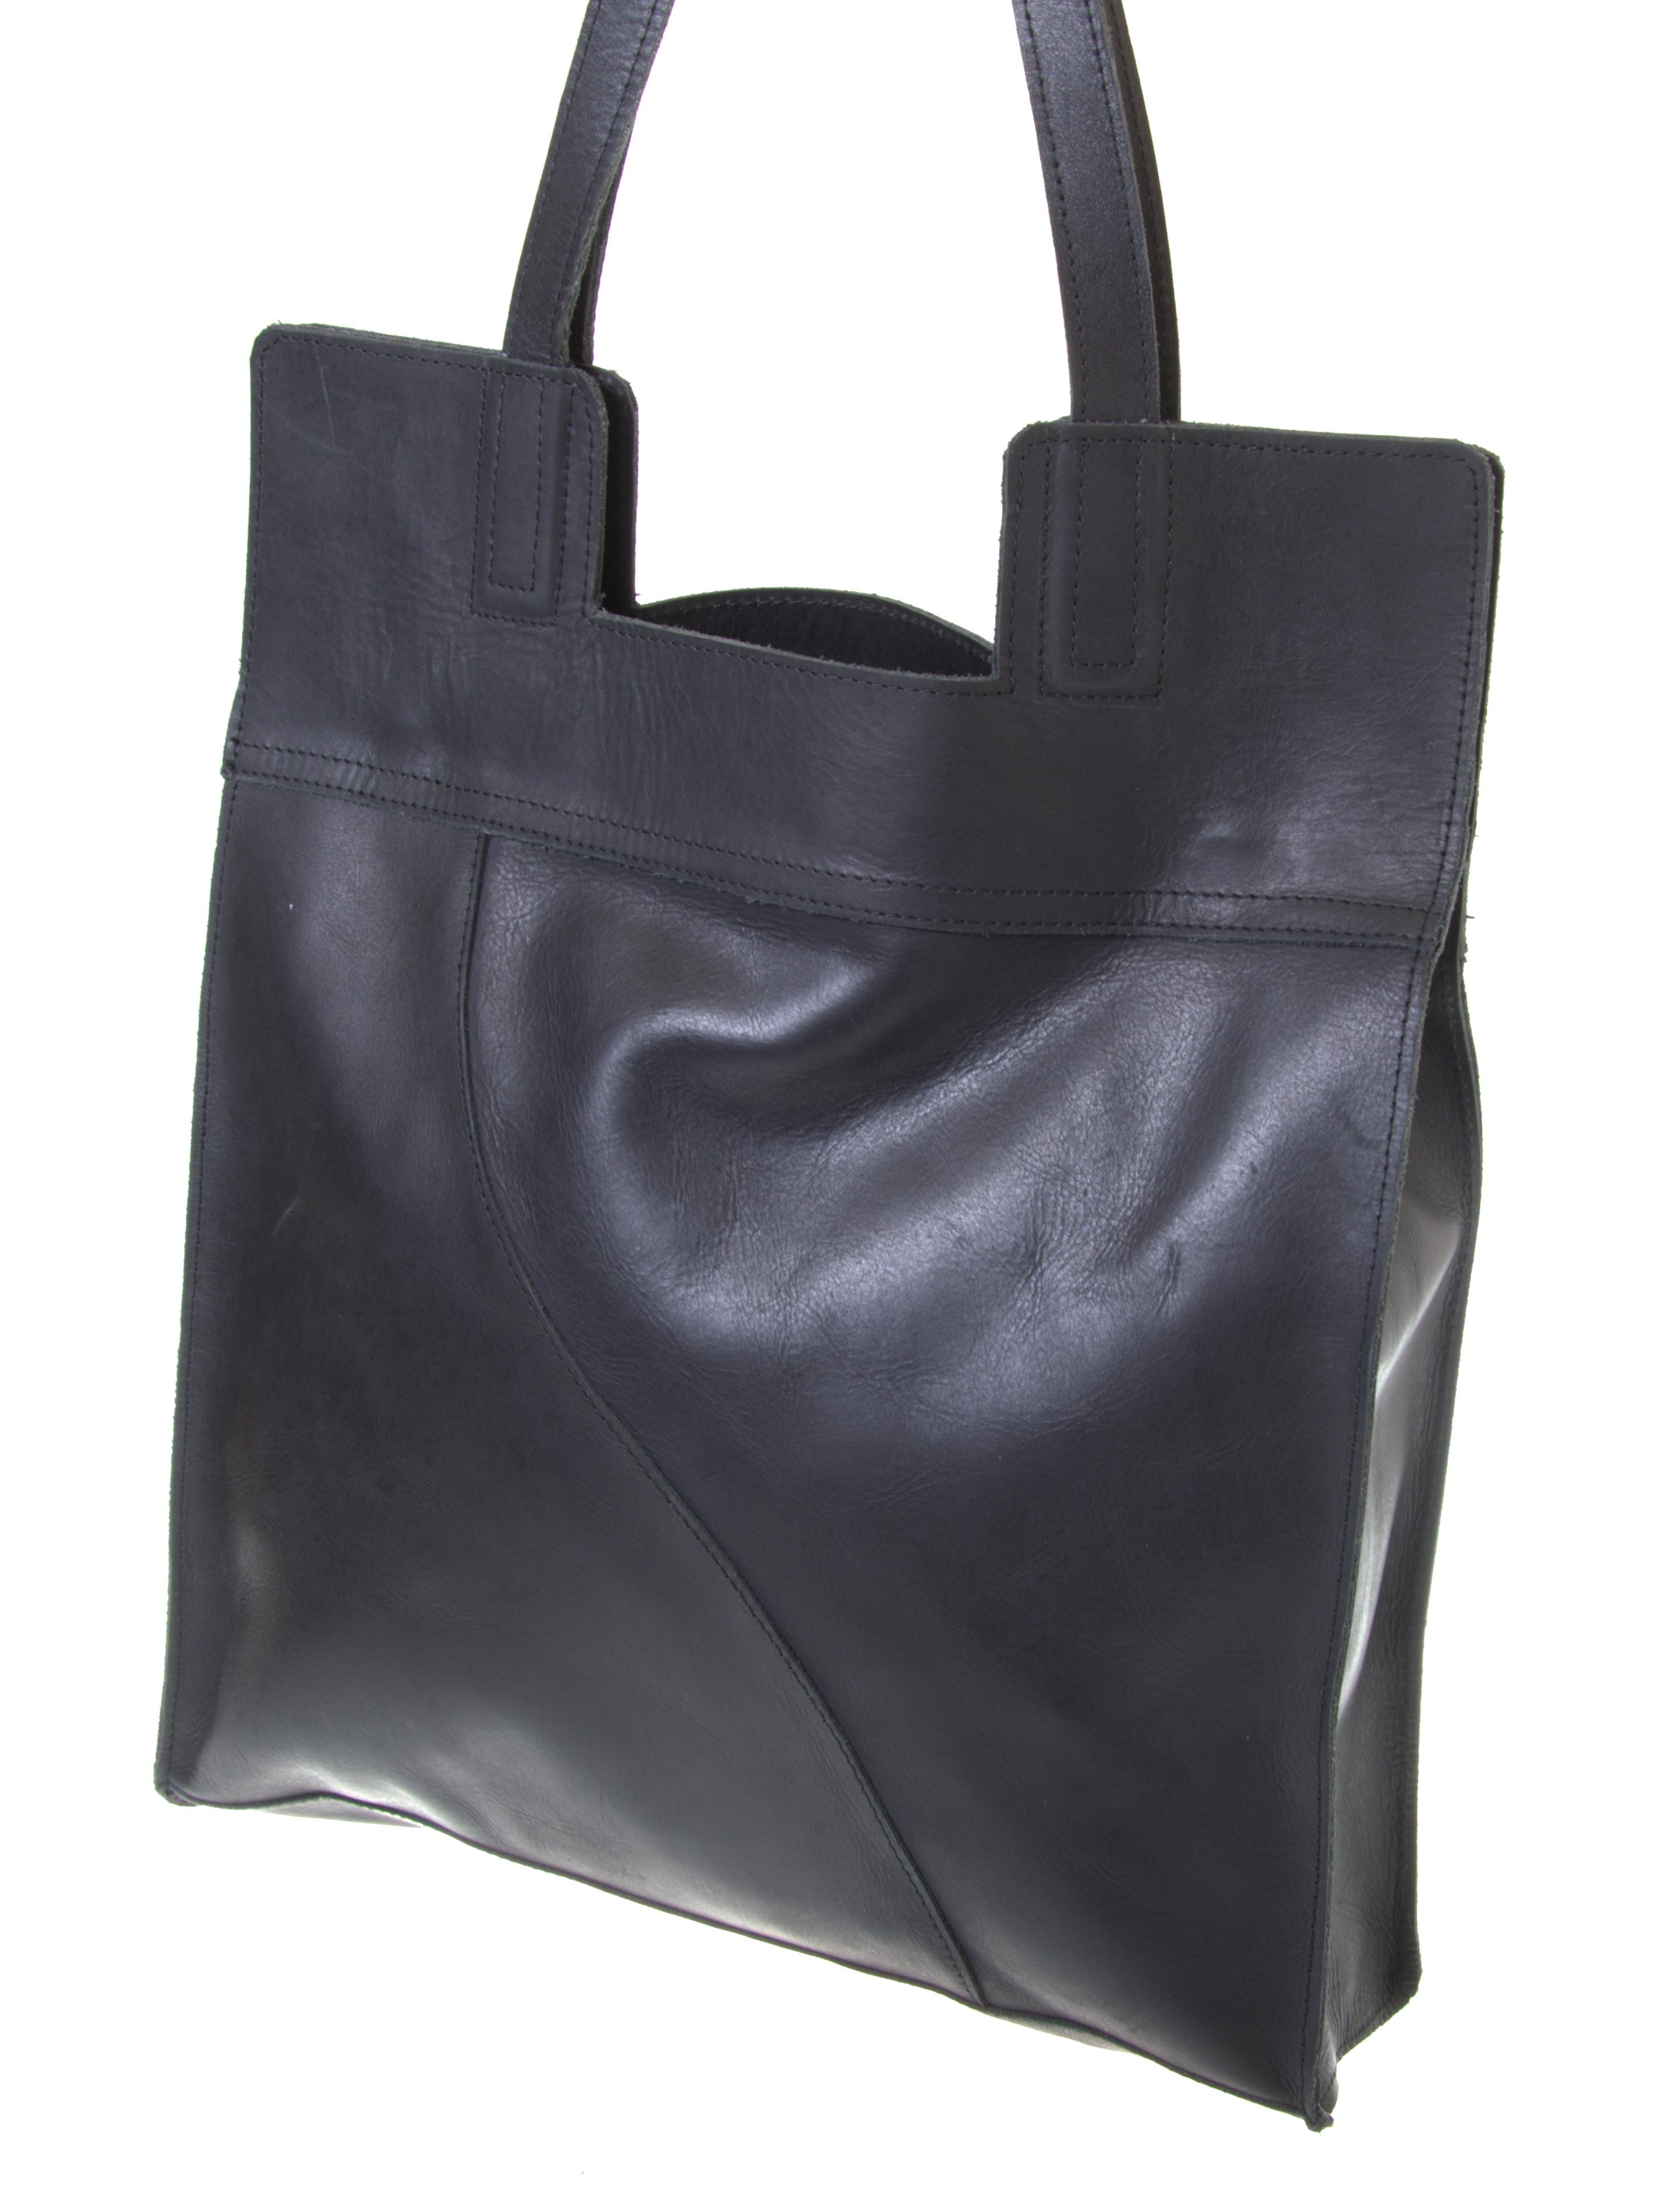 Addis - Fair trade shopping bag